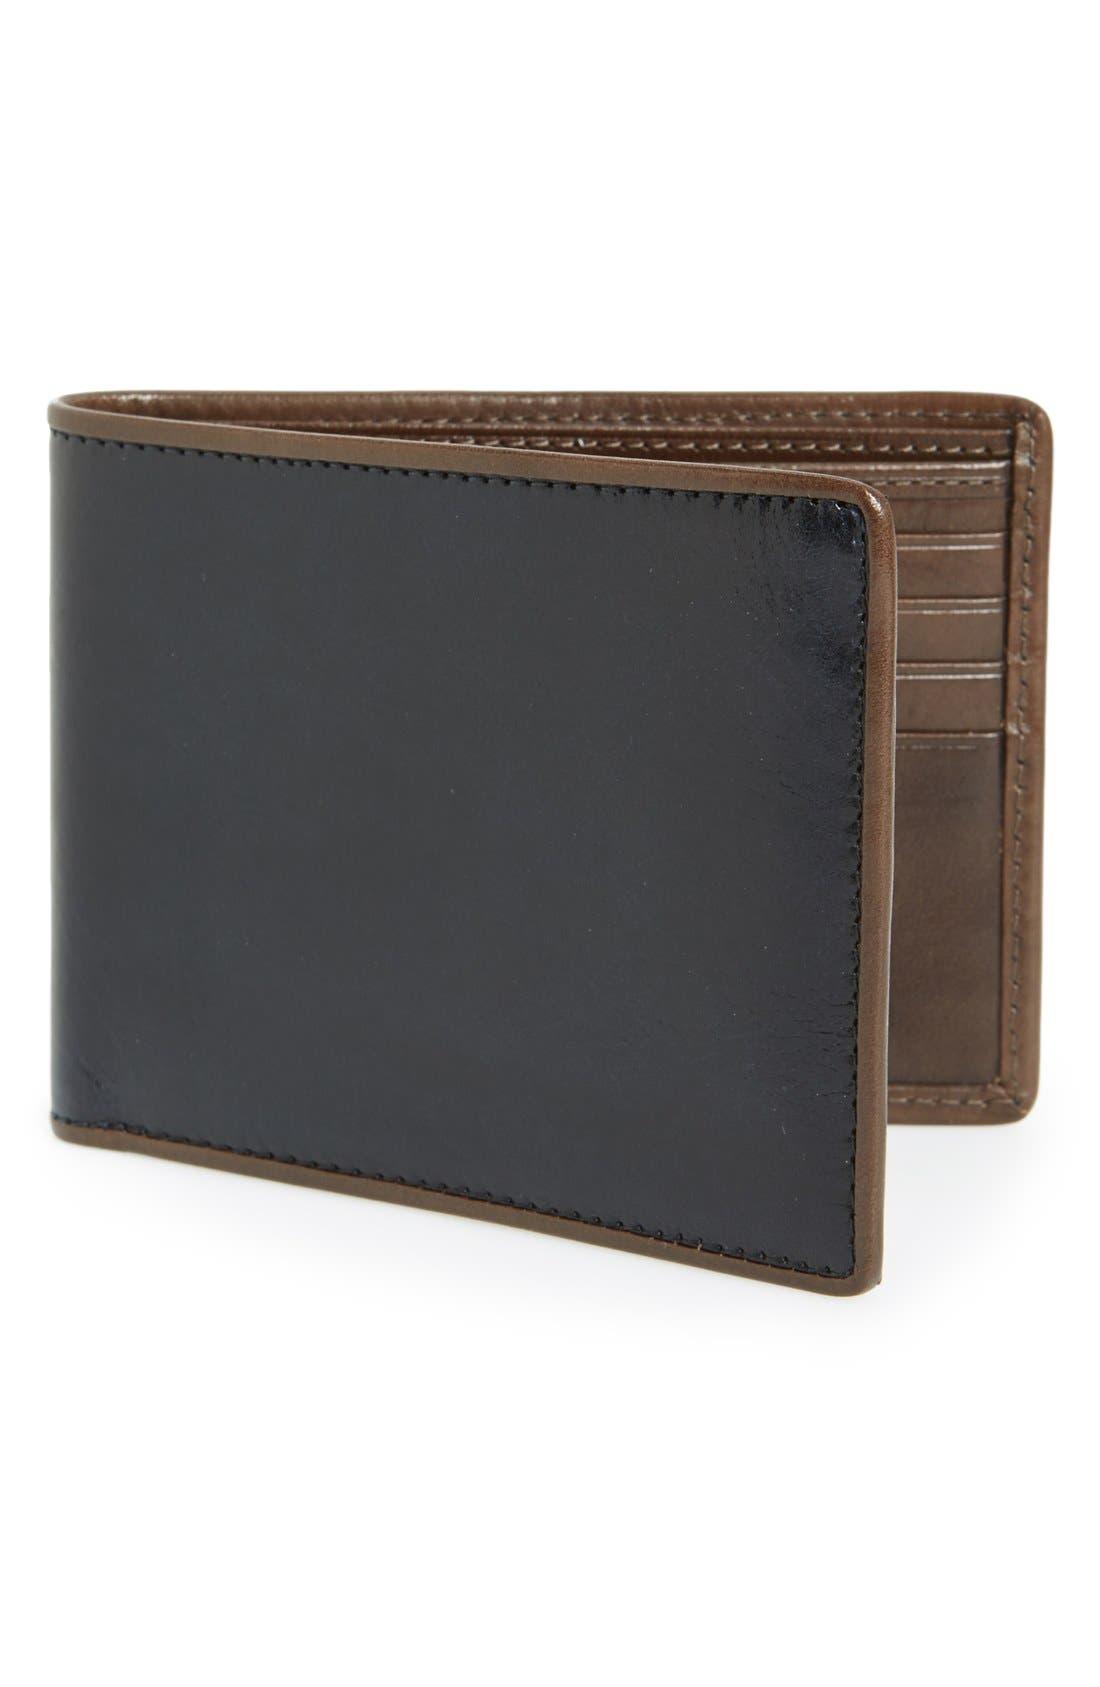 Alternate Image 1 Selected - Bosca 'Montreal' Wallet